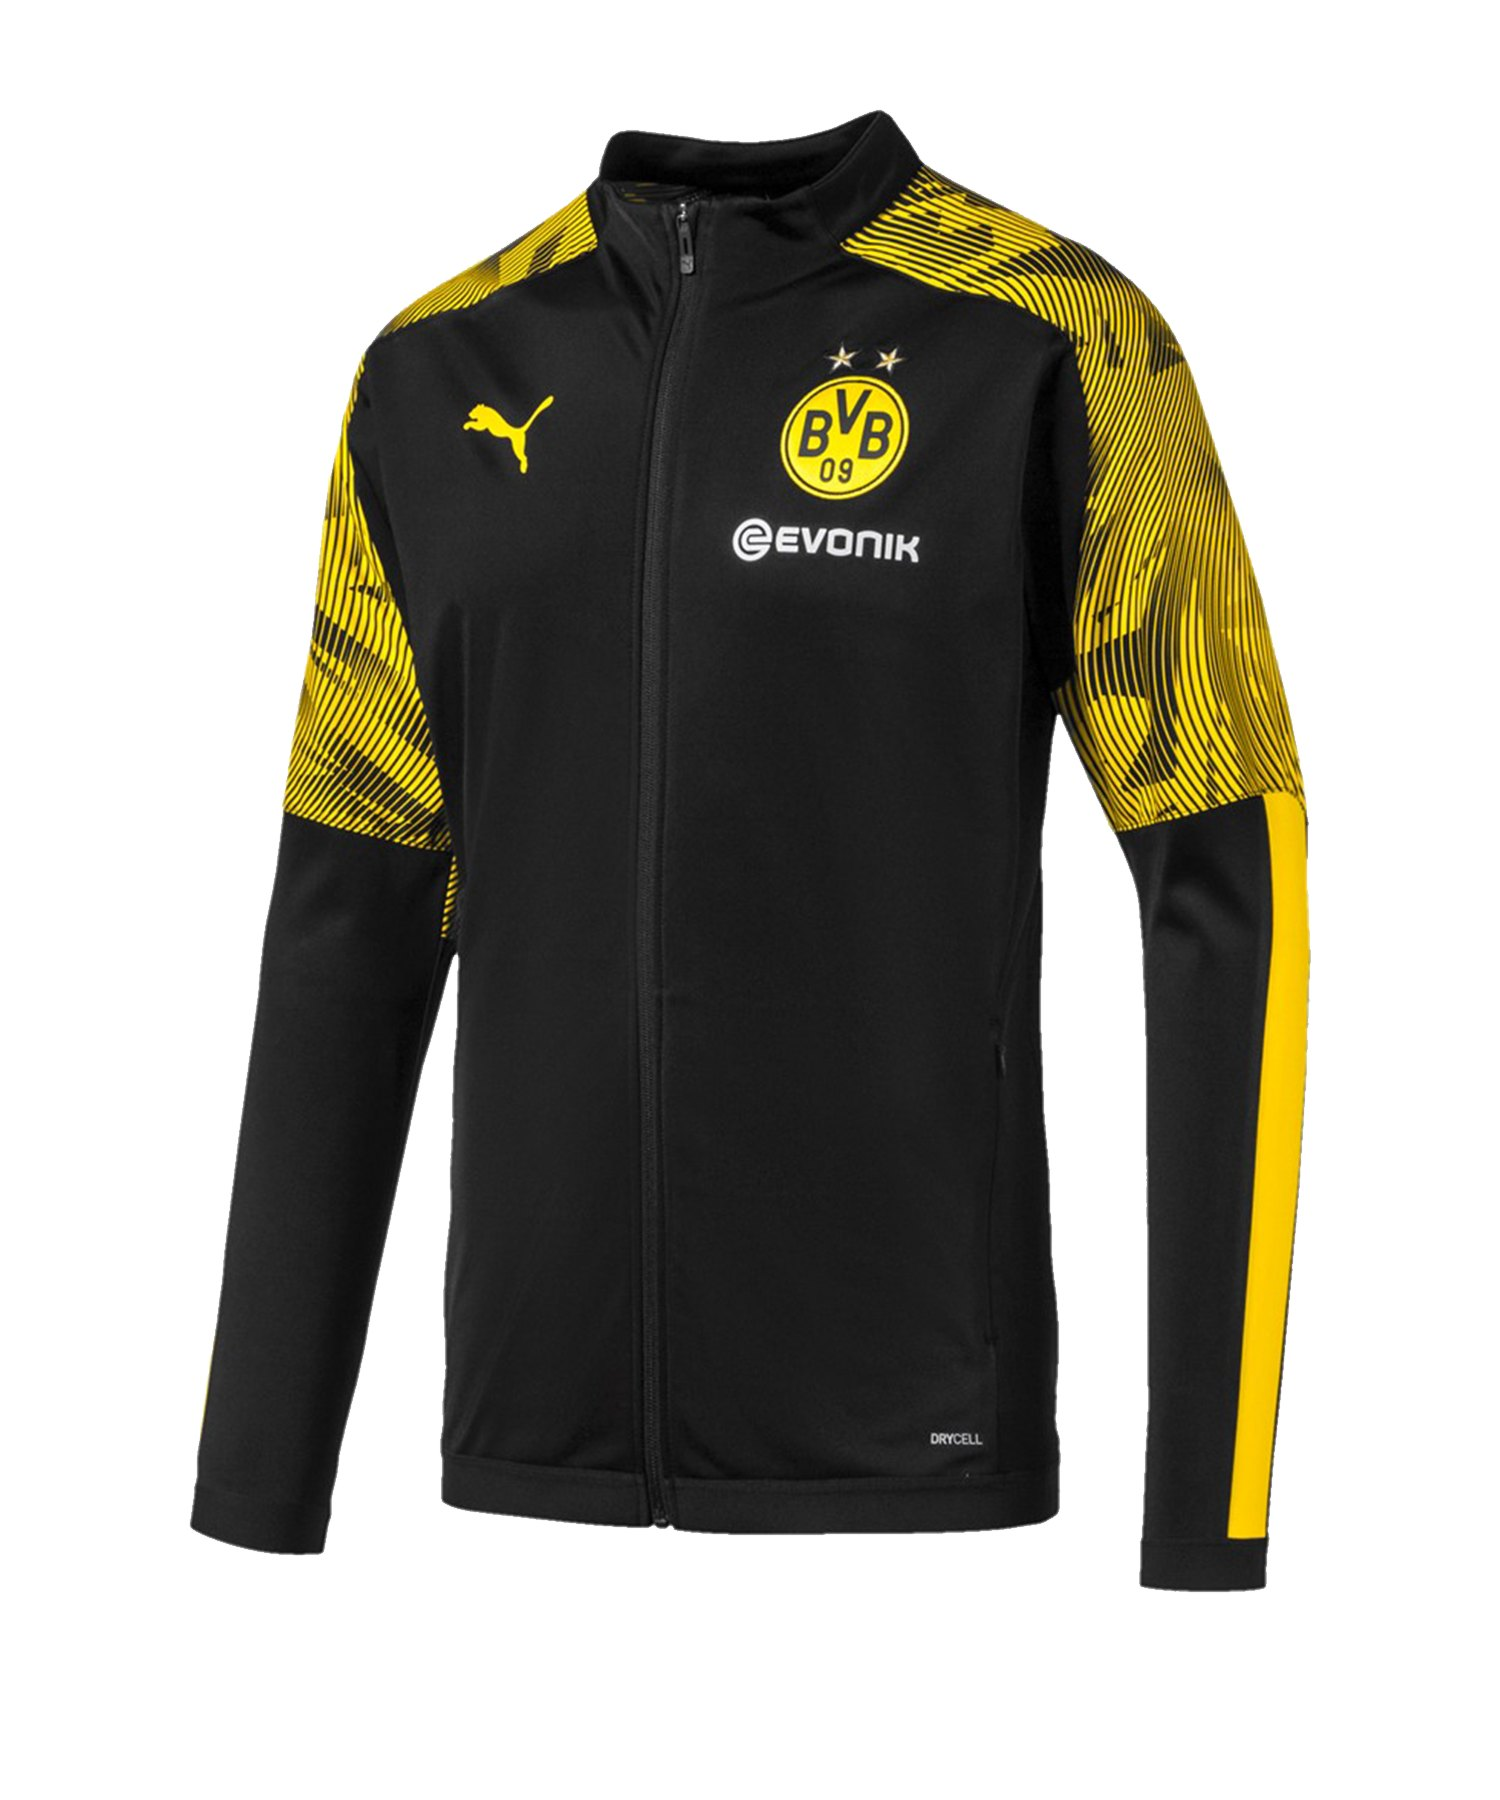 PUMA BVB Dortmund Polyesterjacke Schwarz Gelb F02 - Schwarz